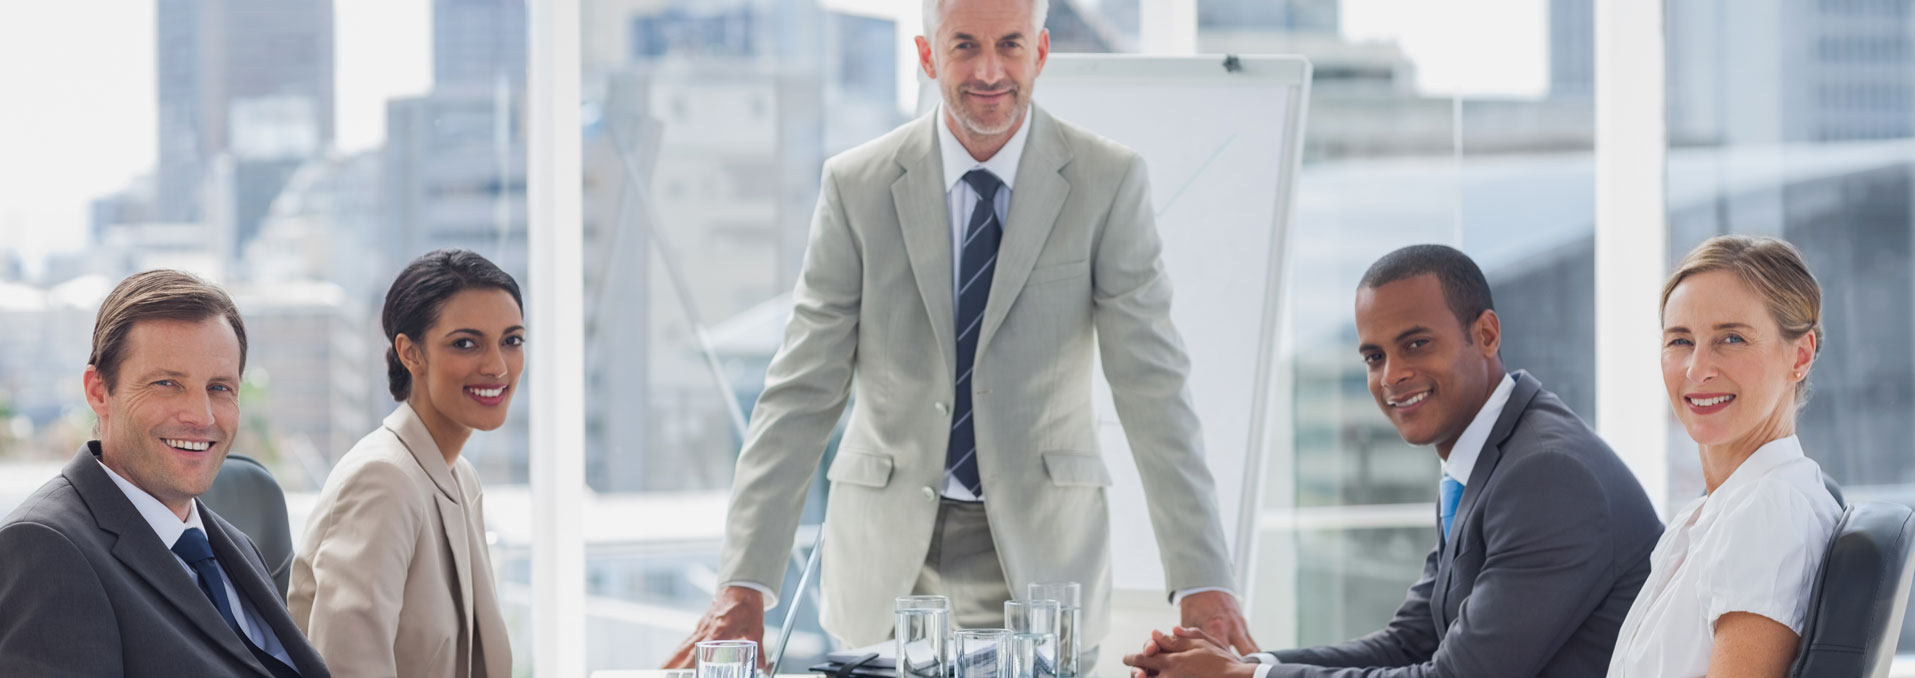 Mortgage Lenders | Self Employed Mortgage | Brampton Mortgage Broker - Rumy Gill